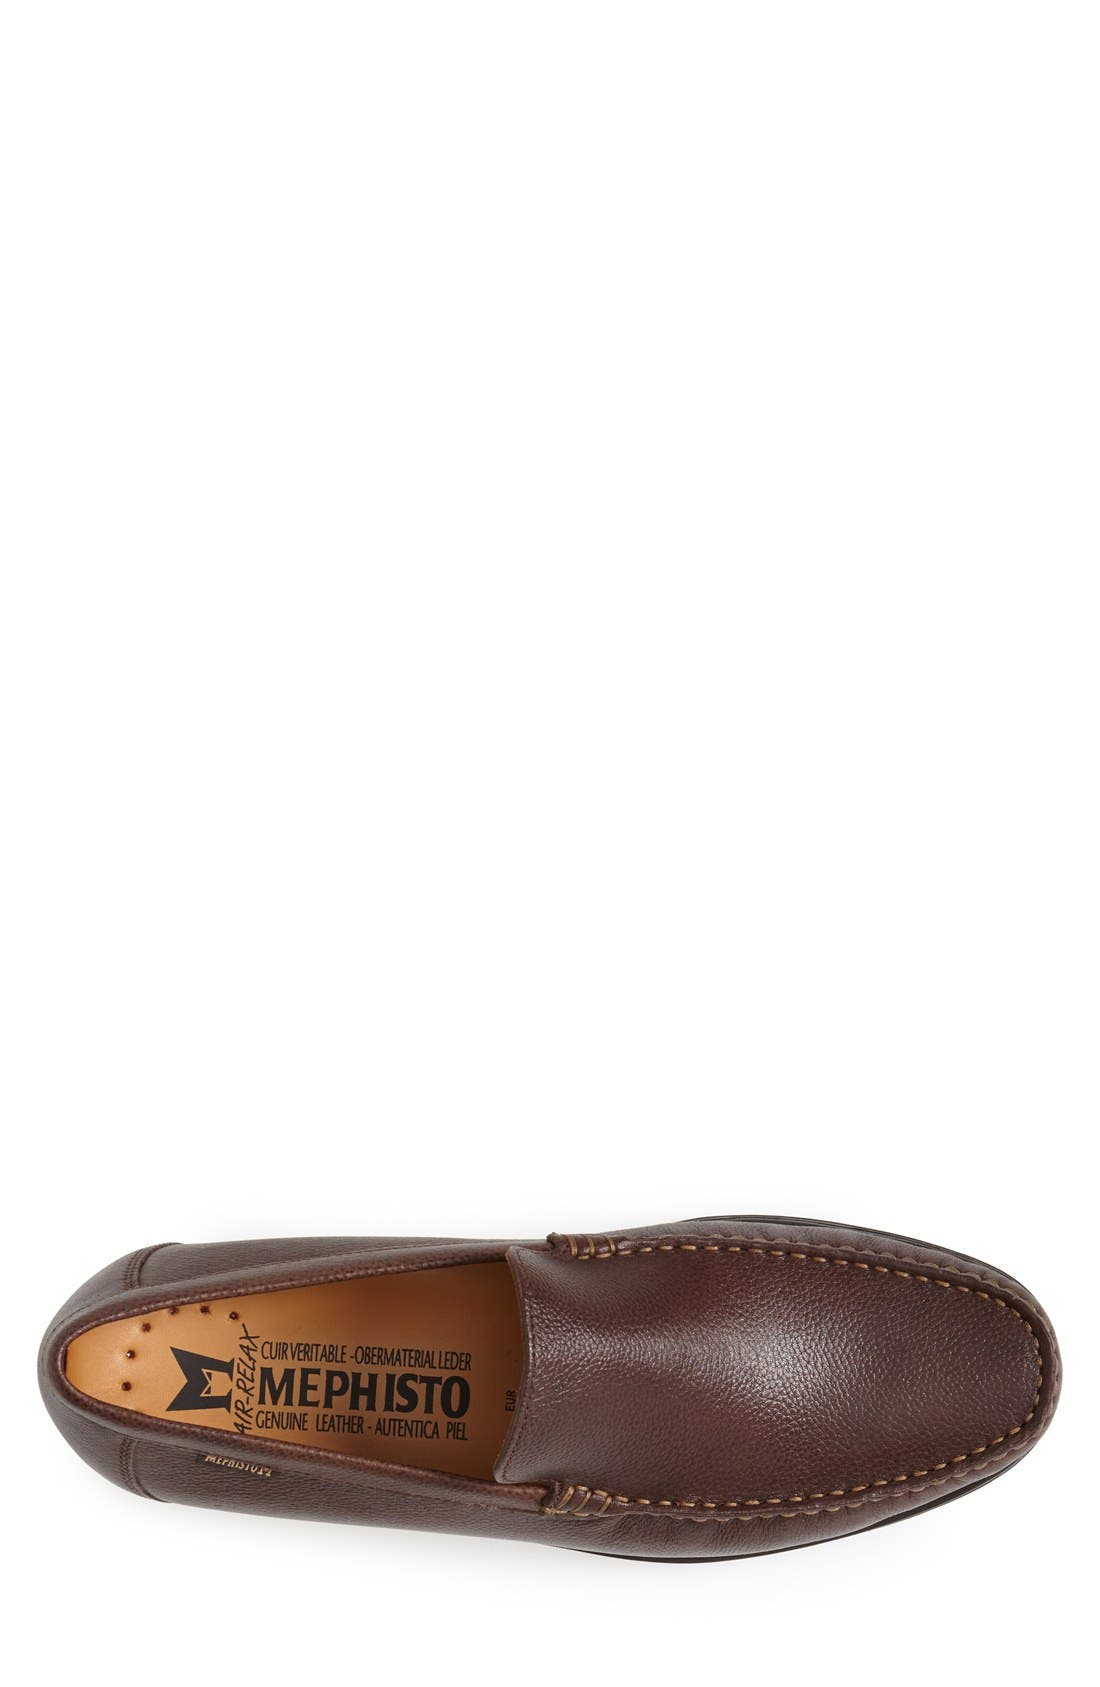 'Henri' Loafer,                             Alternate thumbnail 3, color,                             Chestnut Leather